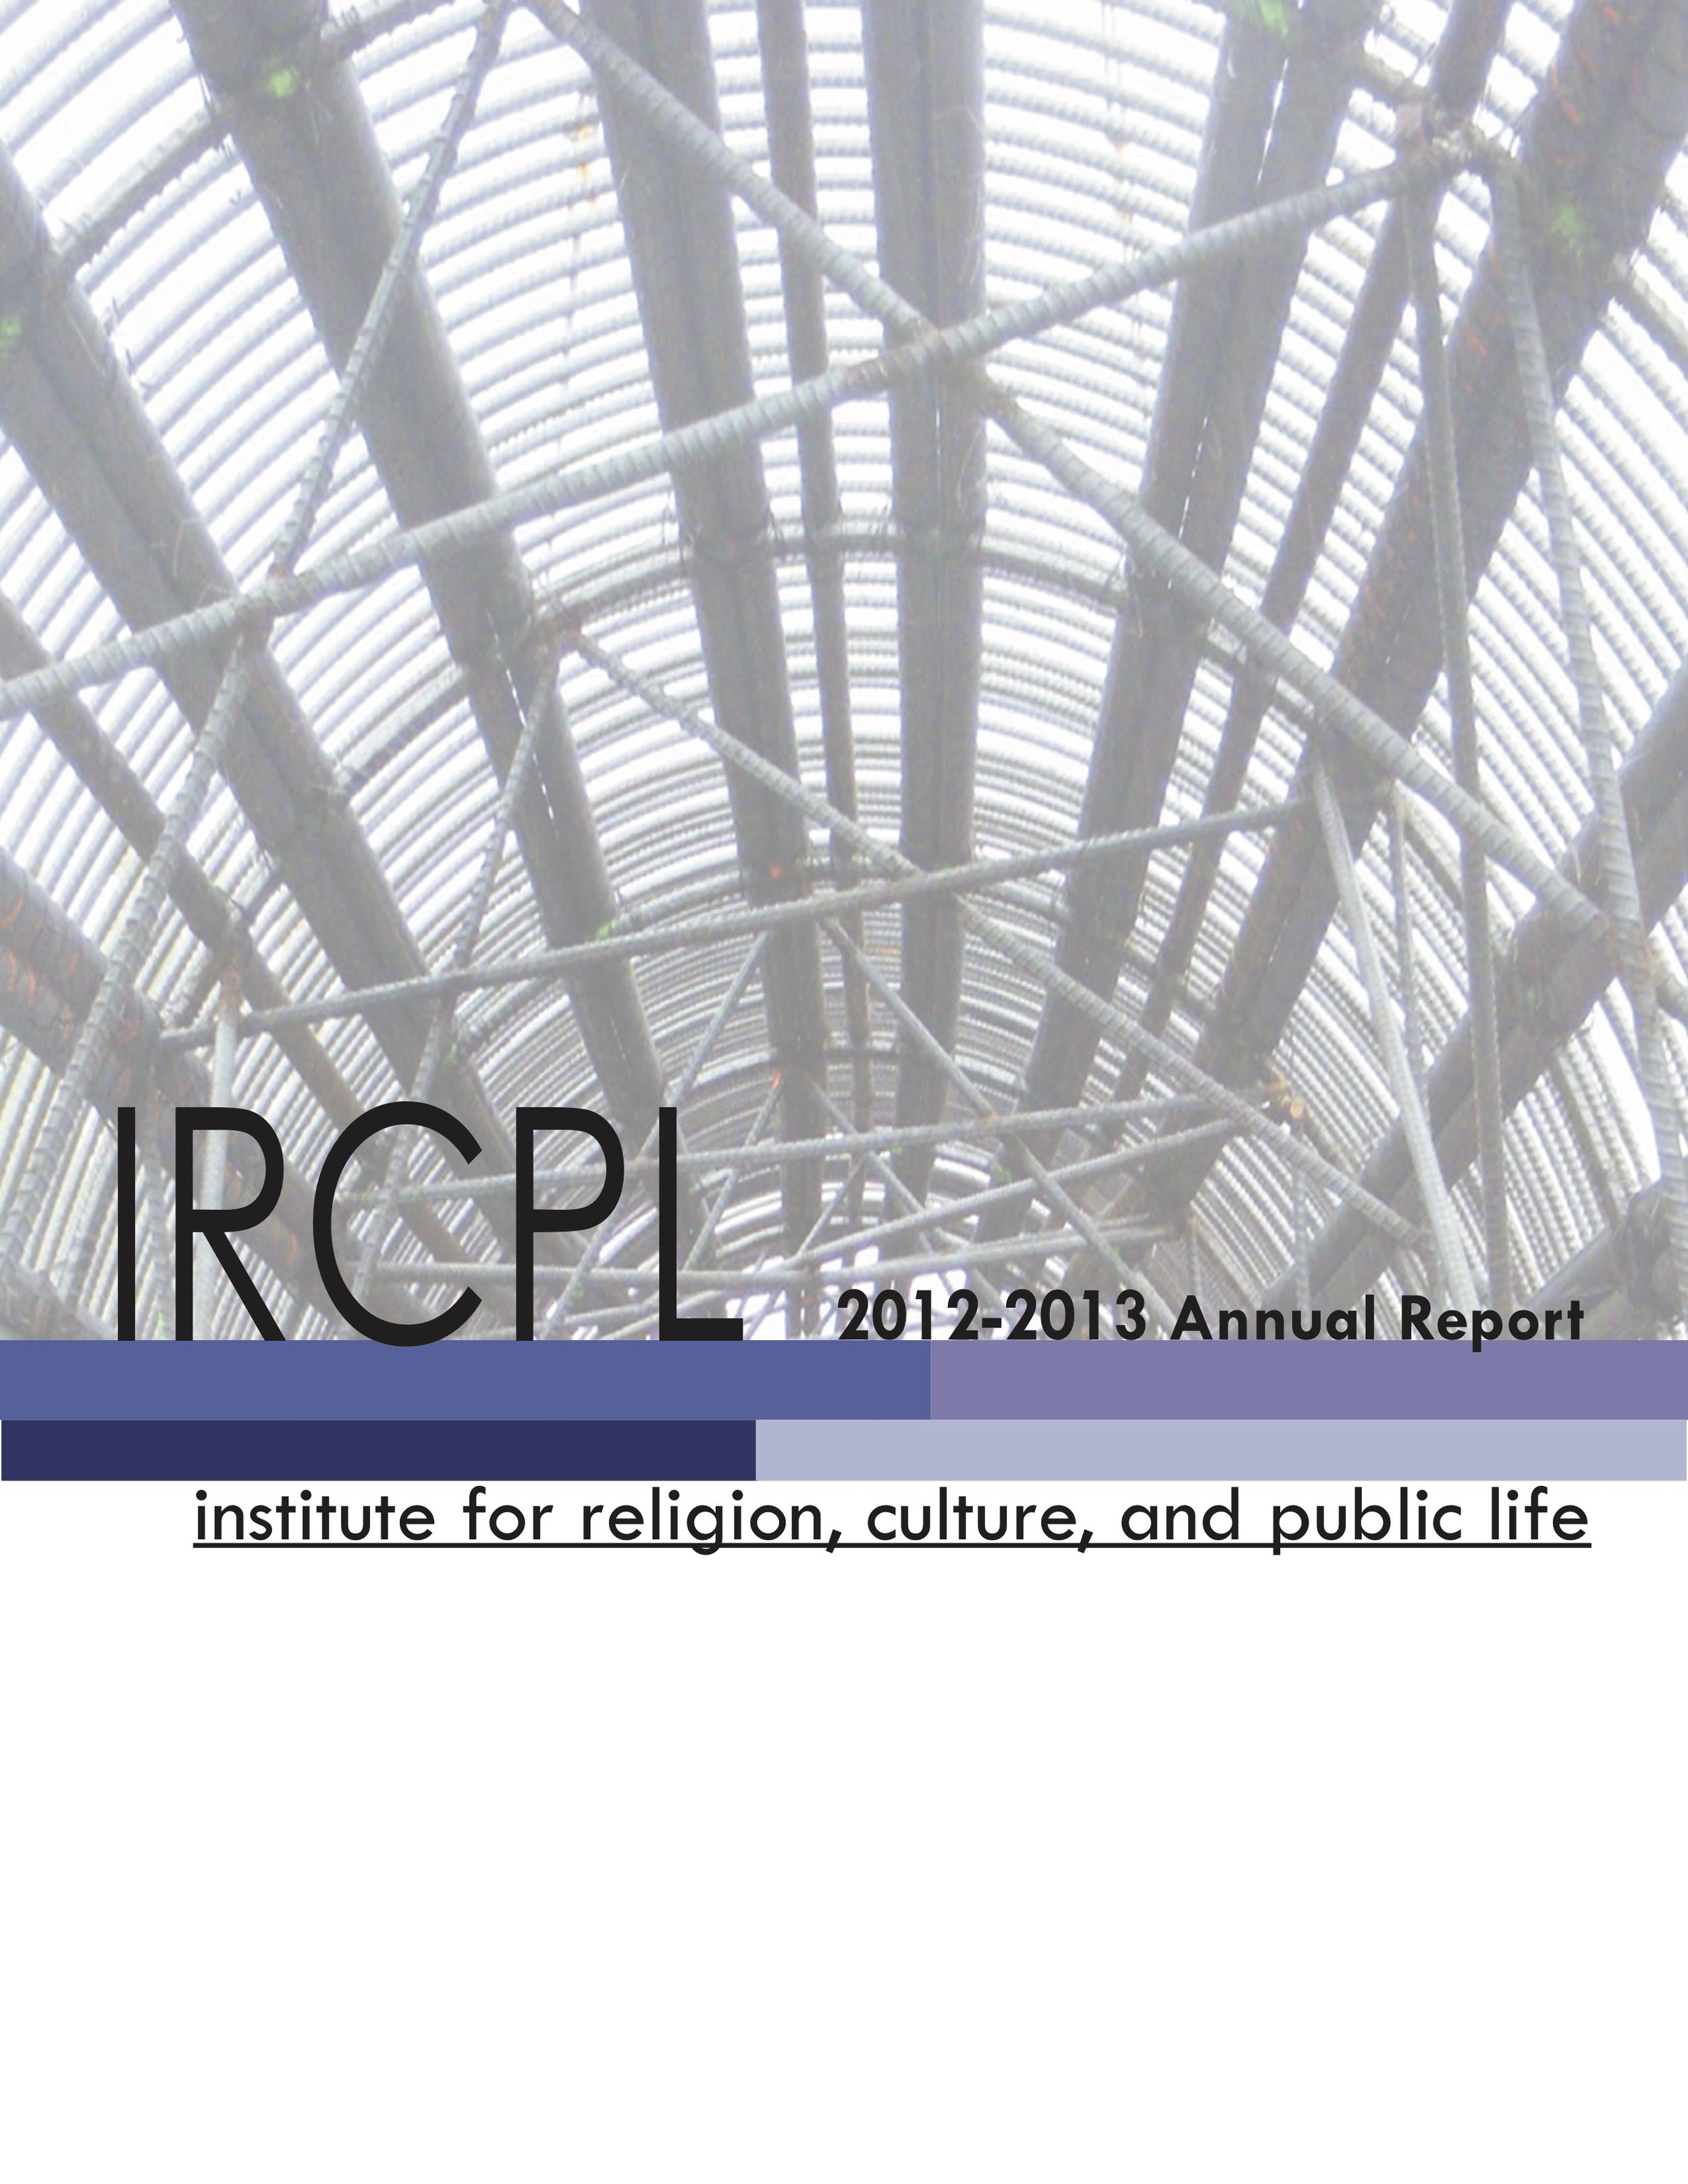 IRCPL-Report-2012-2013.jpg